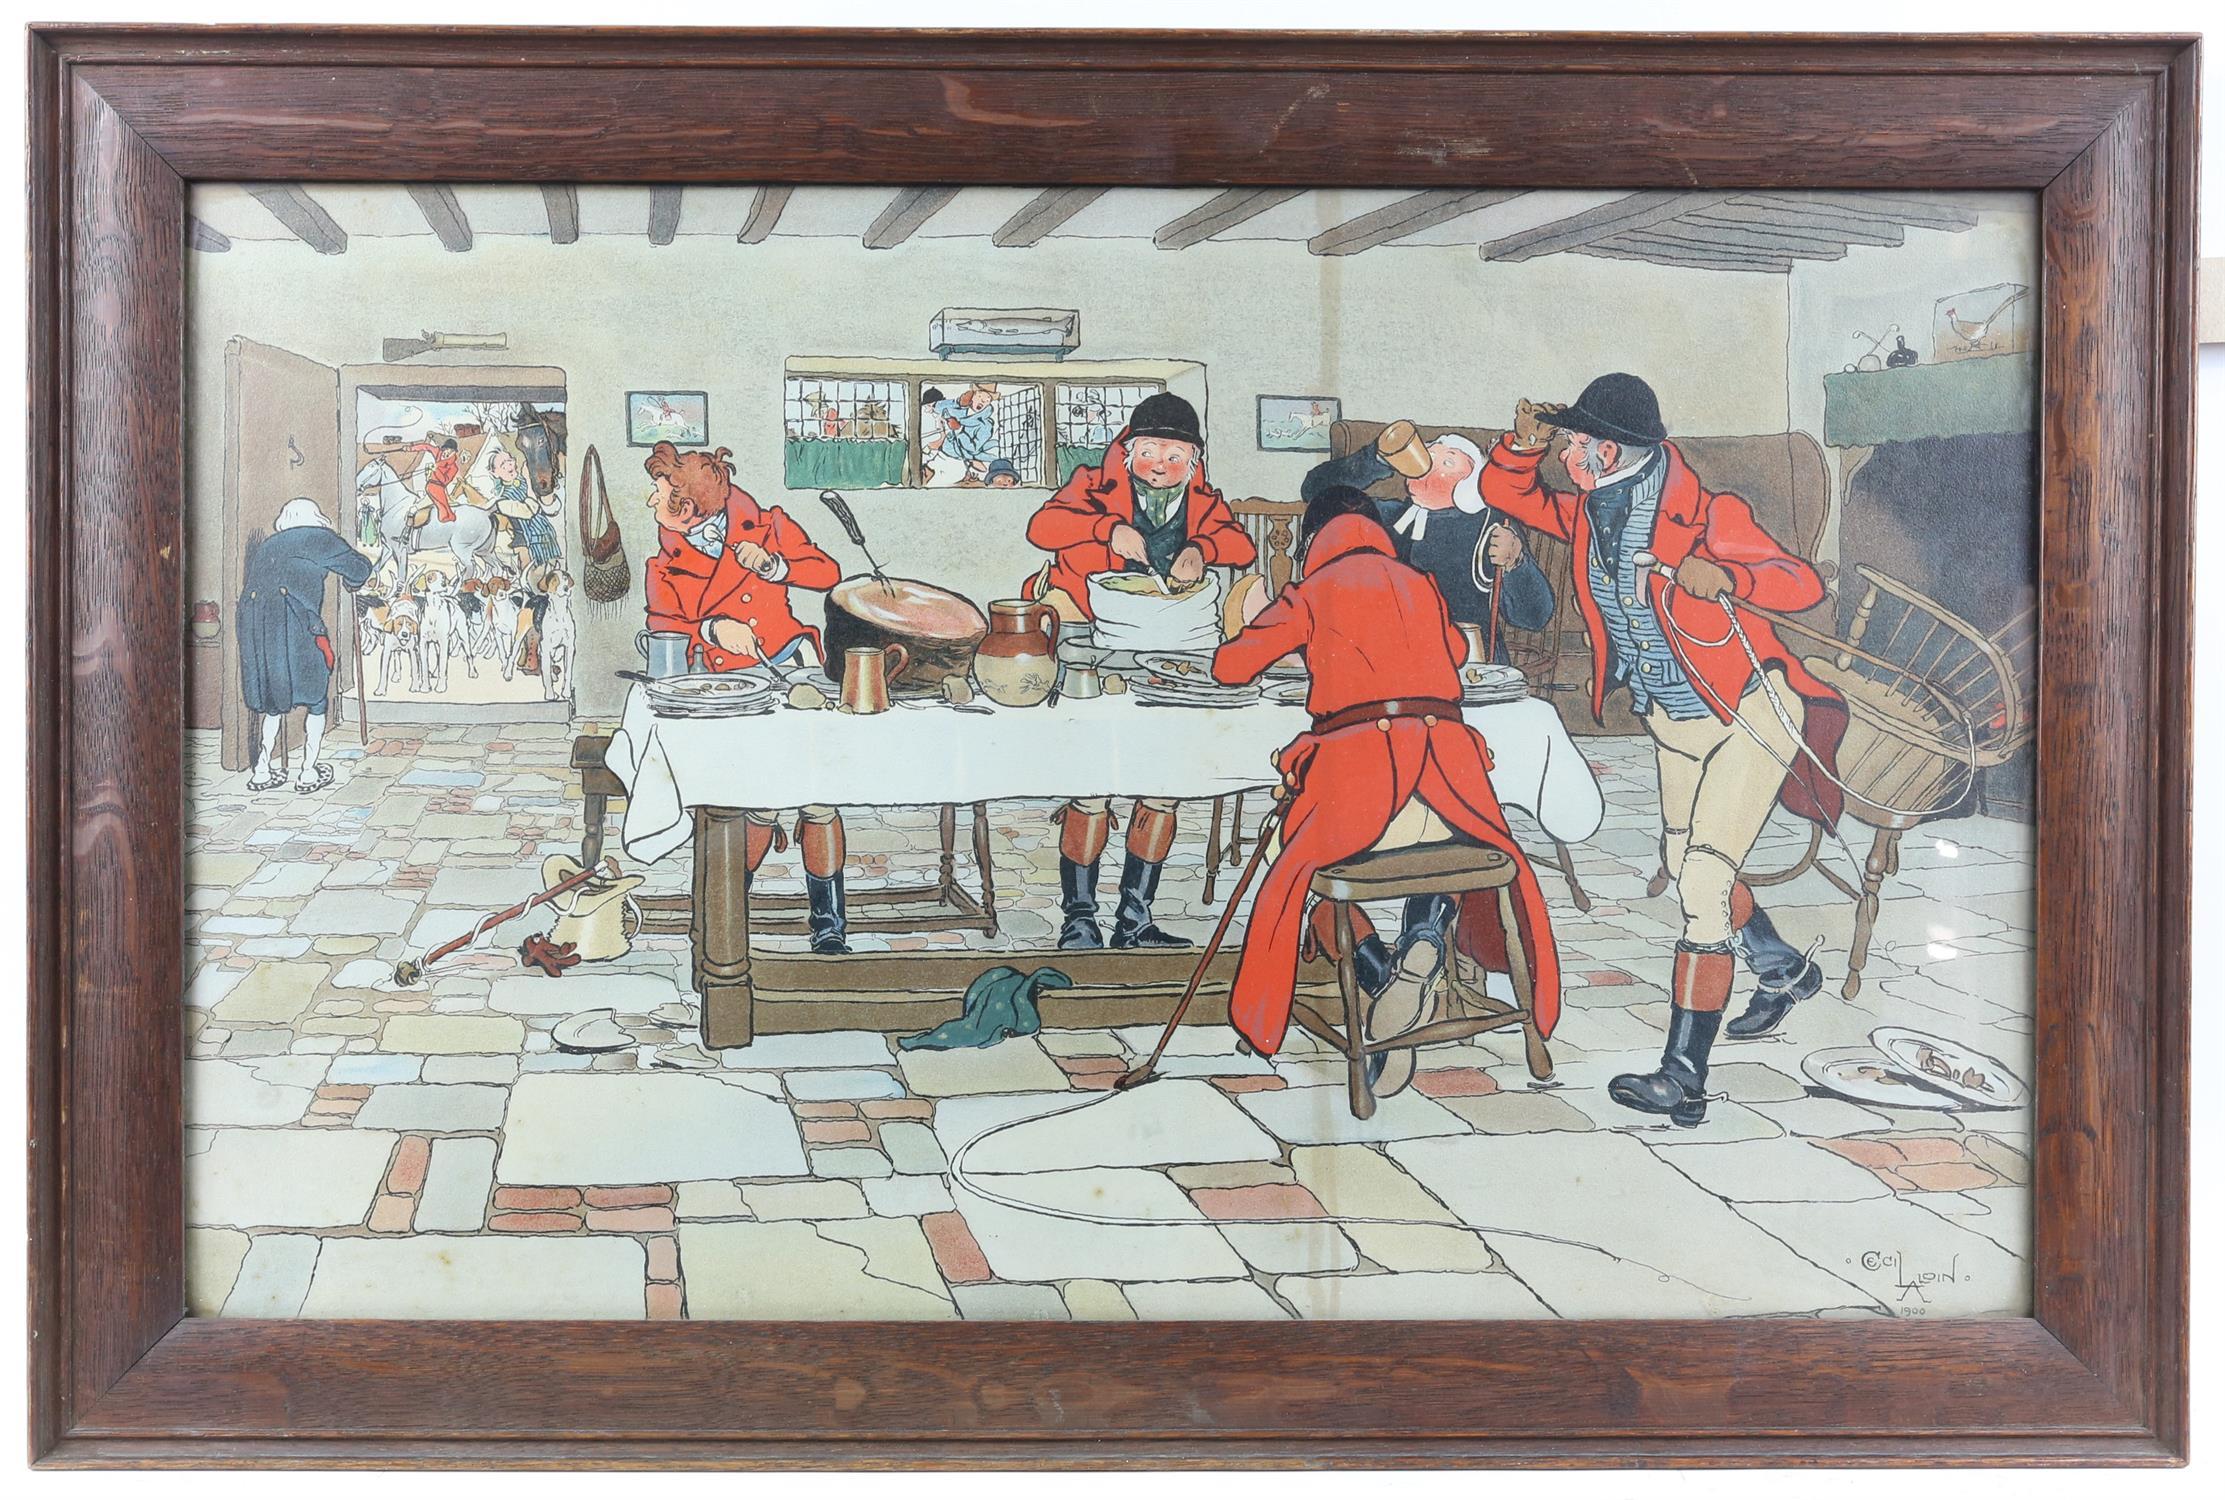 After Cecil Aldin, print of huntsmen in a tavern, 37 x 60.5cm, - Image 2 of 3